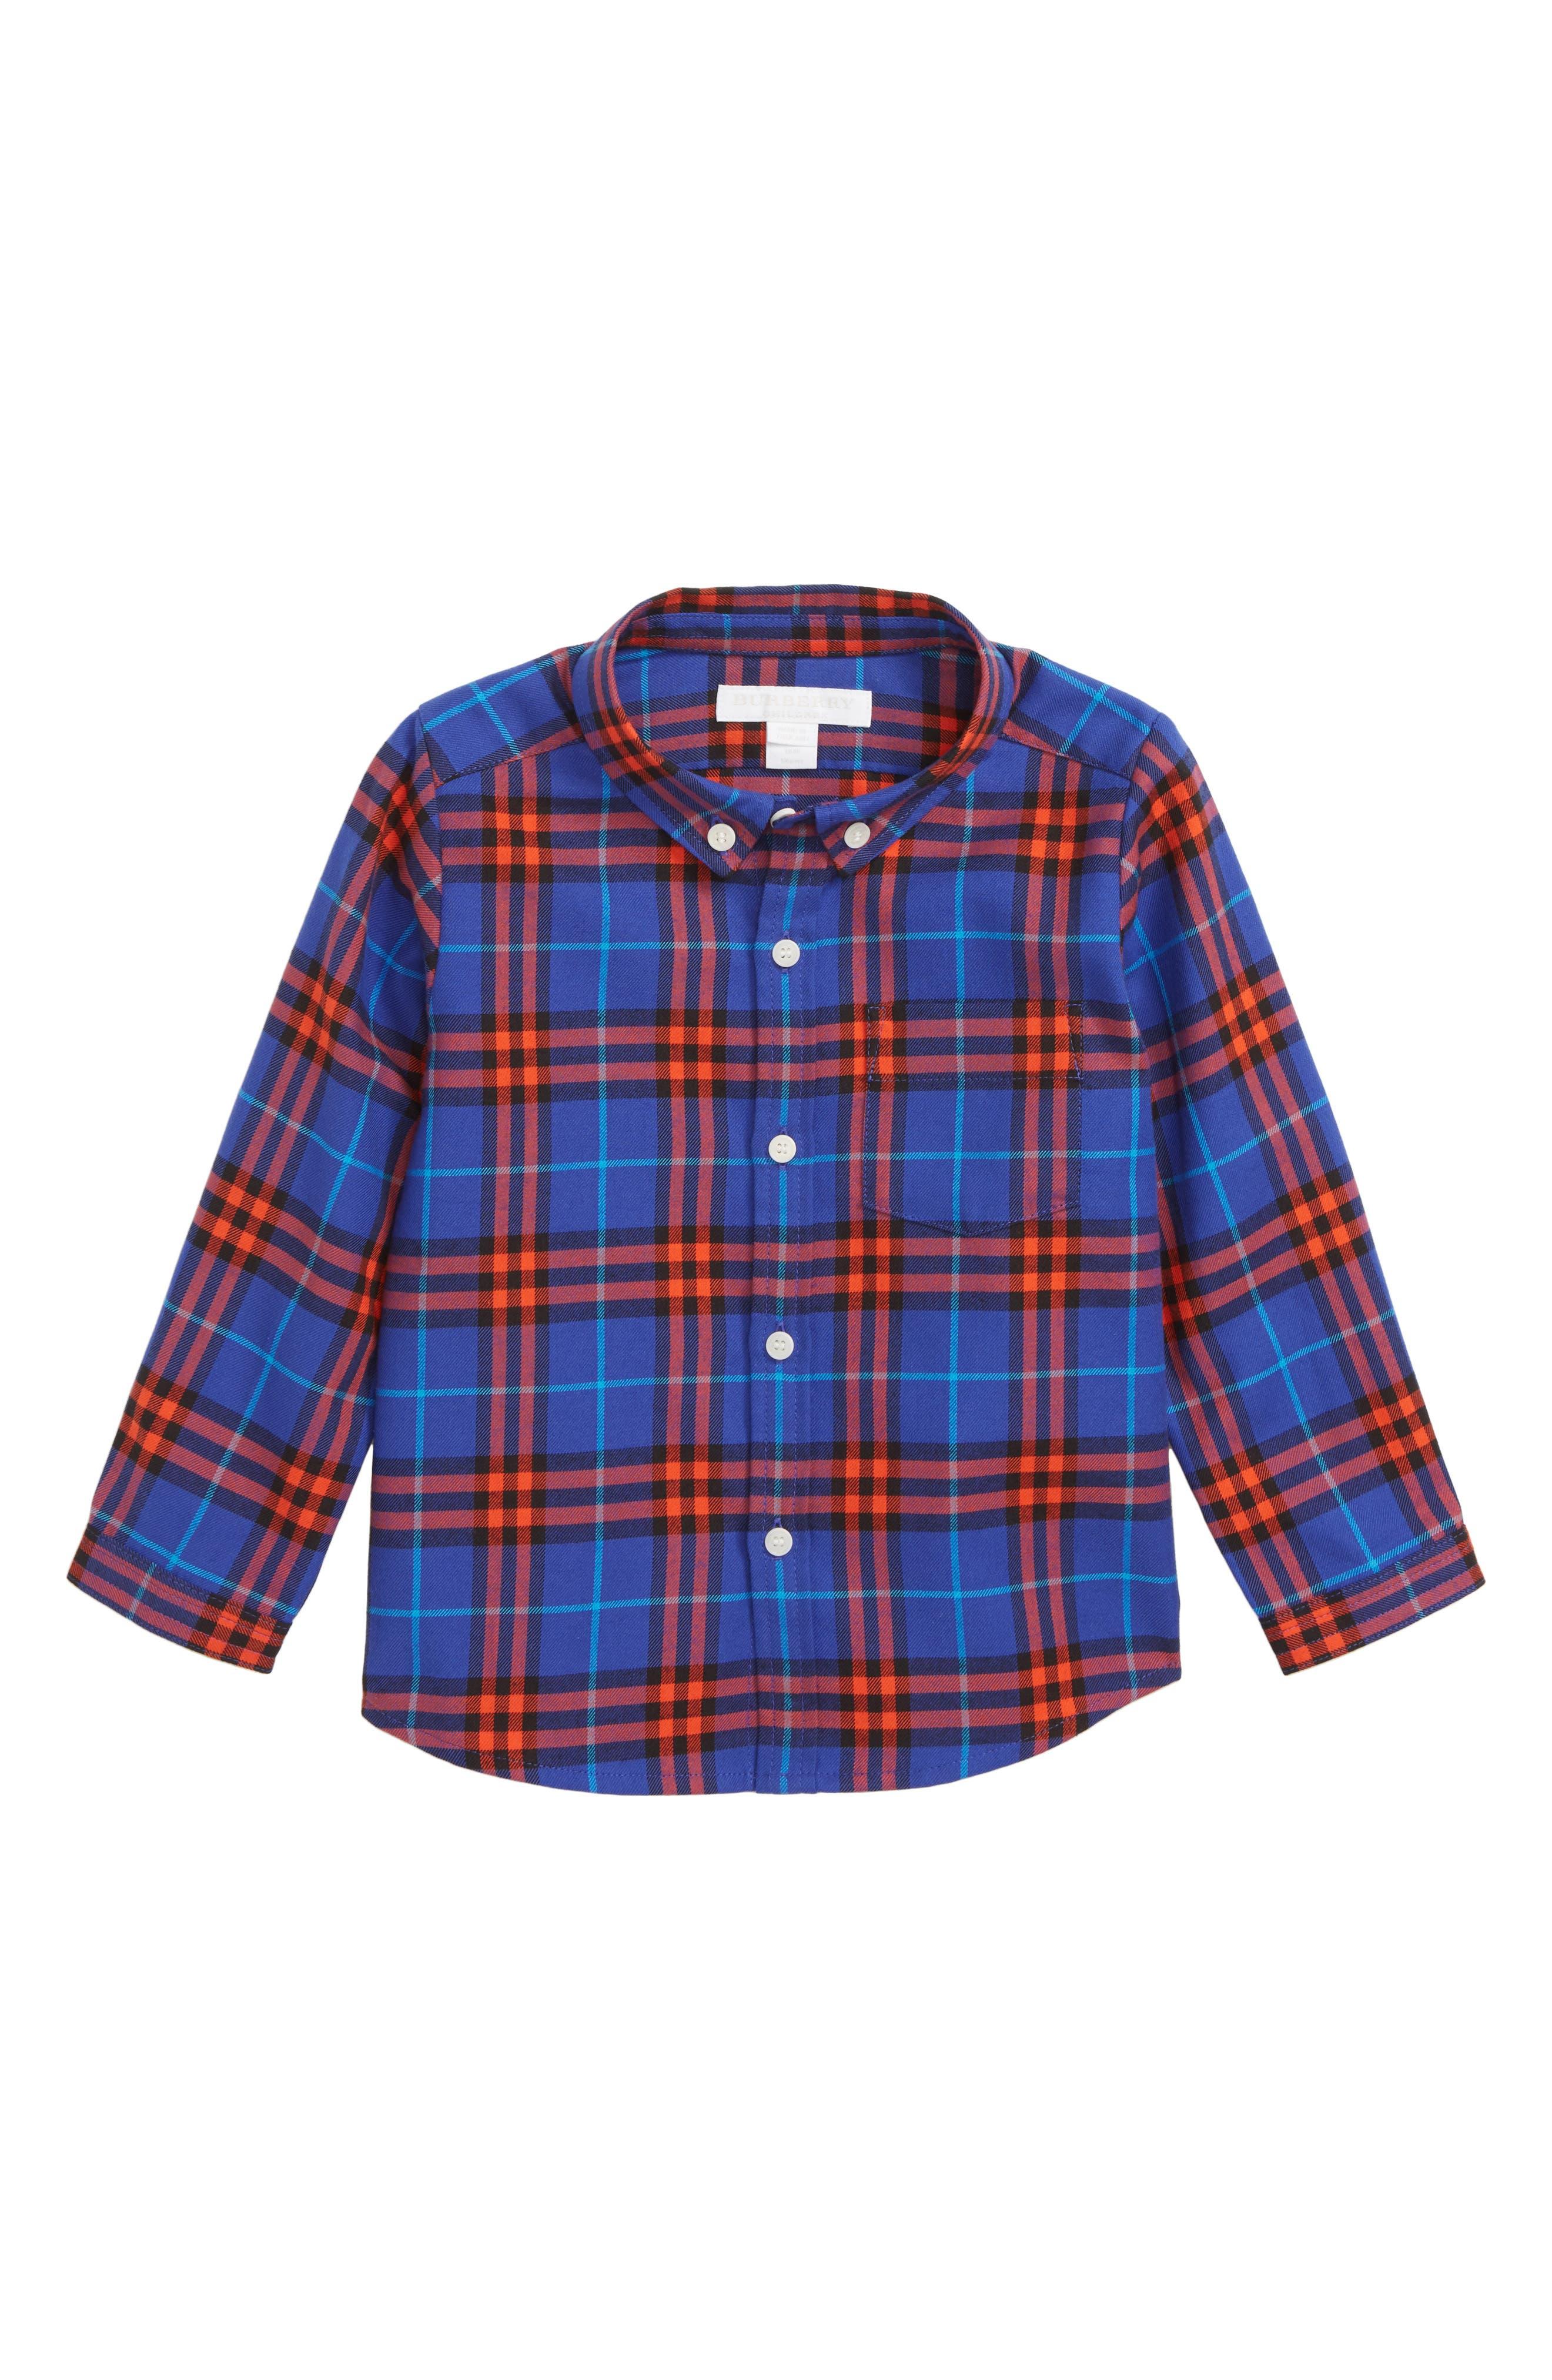 BURBERRY, Fred Plaid Woven Shirt, Main thumbnail 1, color, SAPPHIRE BLUE IP CHK